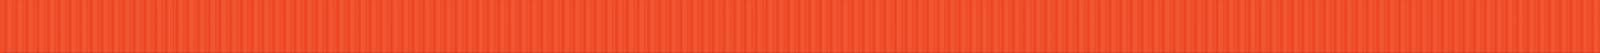 summer-time-ribbon-orange-basic